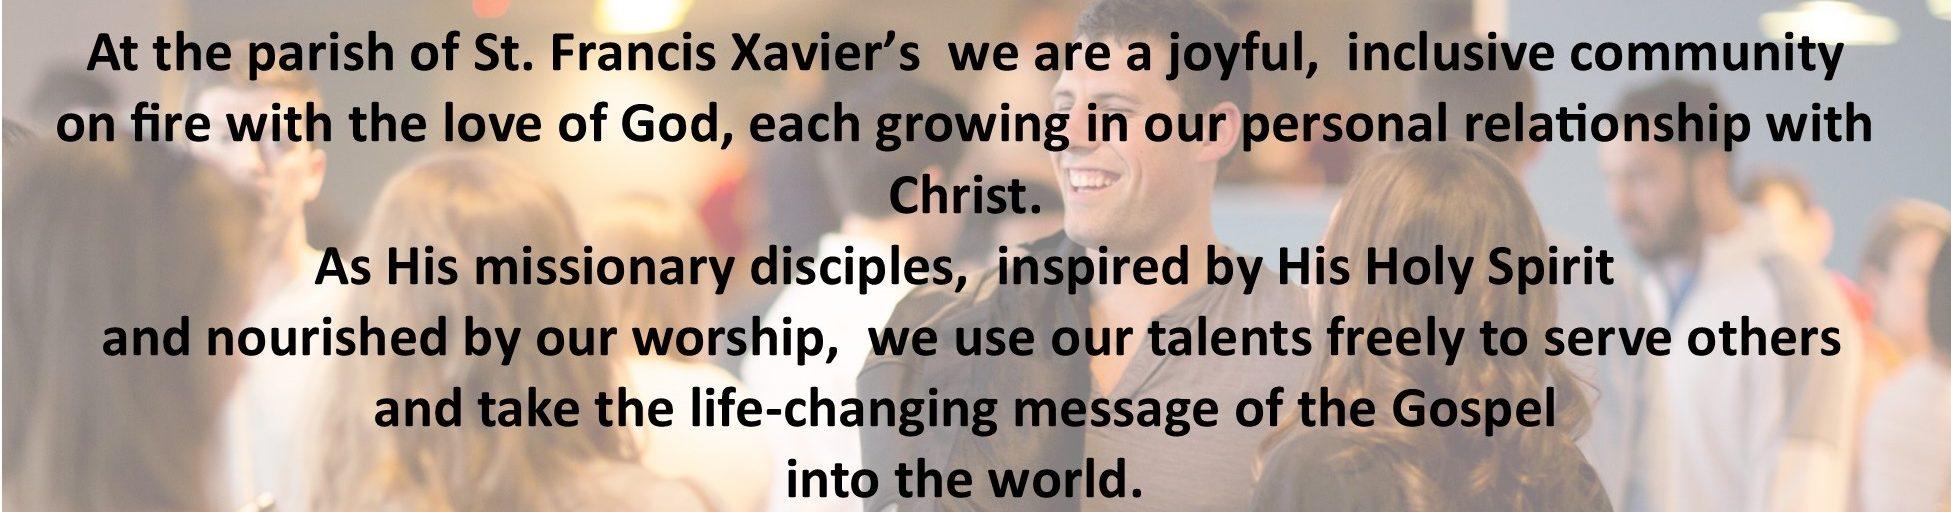 The Parish of St Francis Xavier's